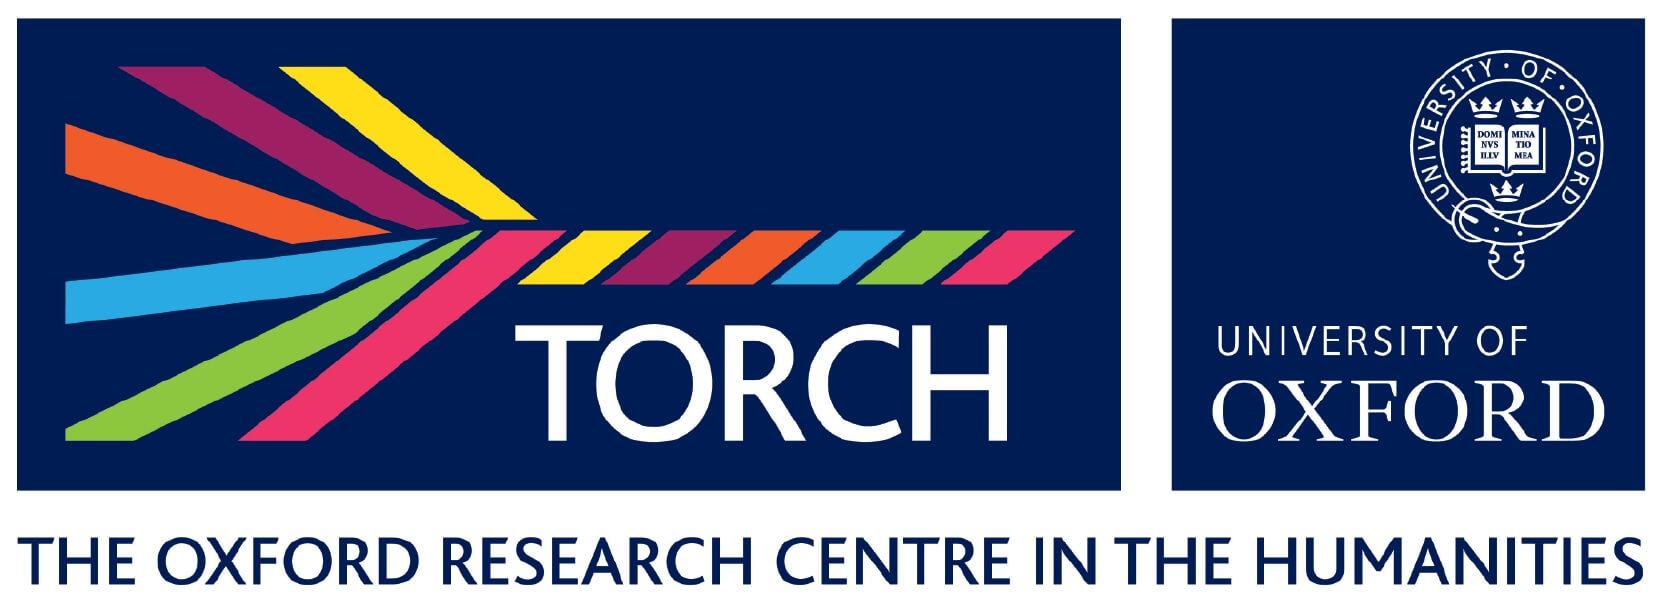 Torch Seminar Series: Fiction and Human Rights